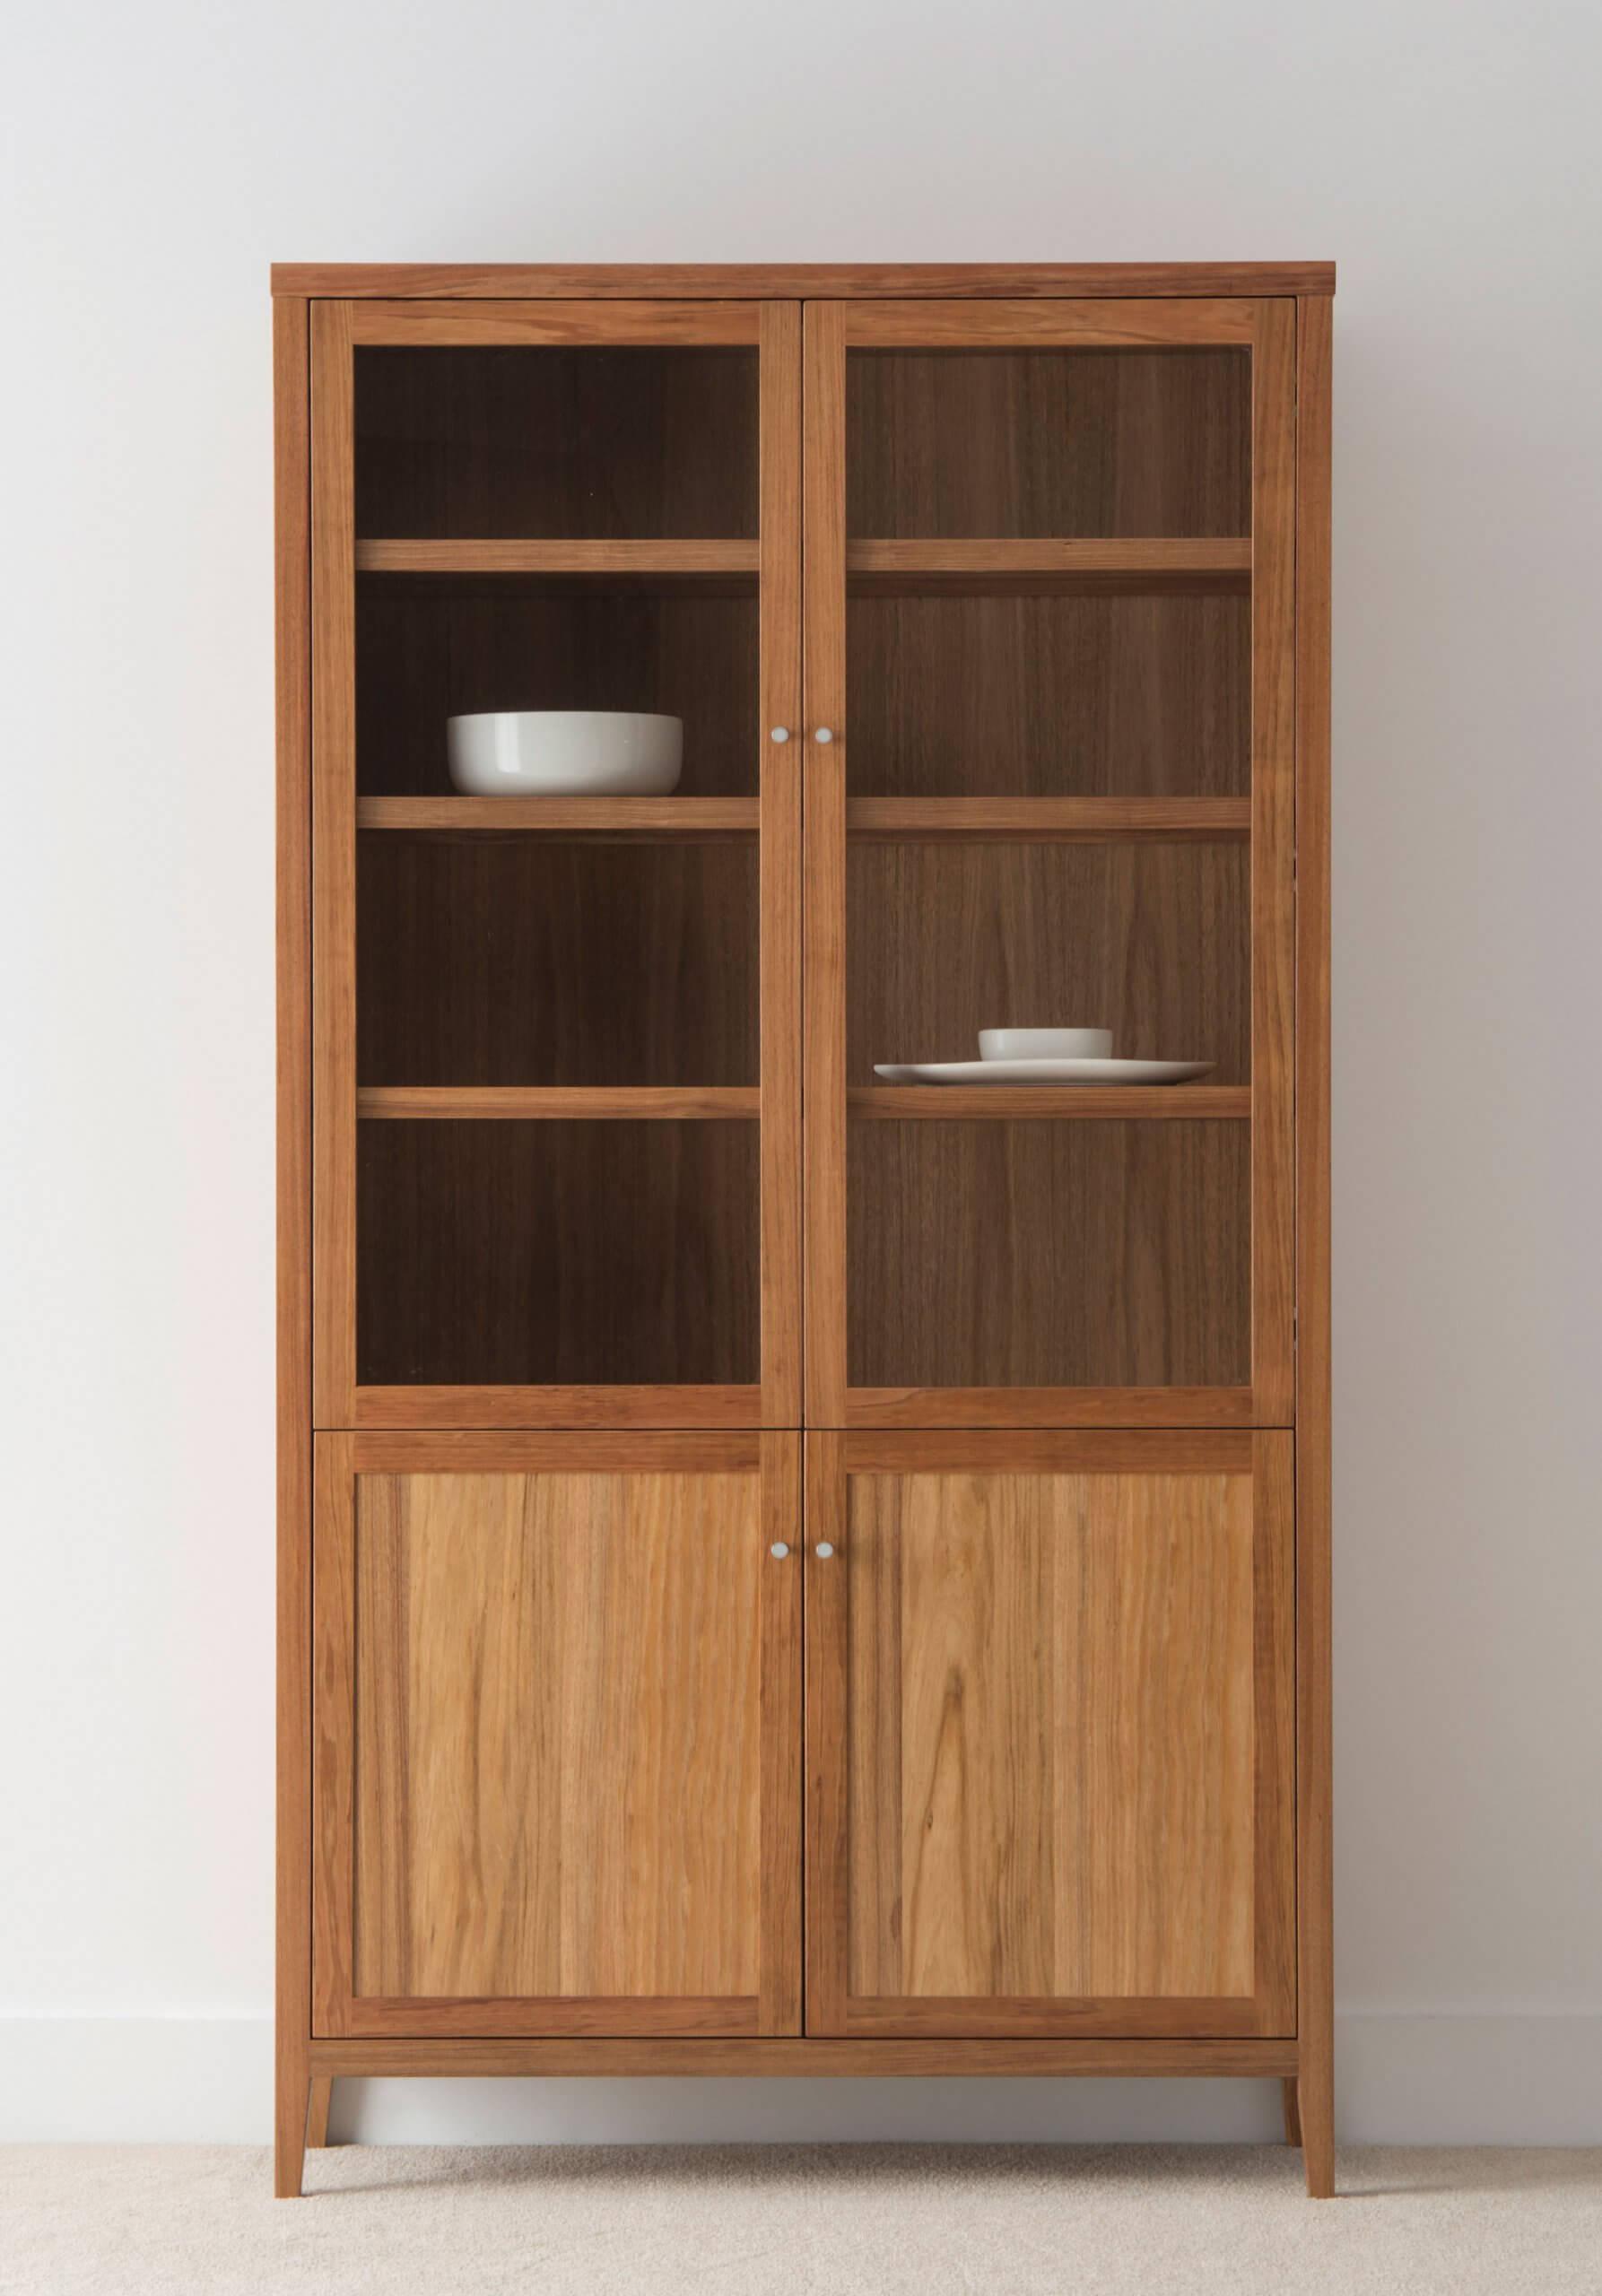 blackwood timber display cabinet with modern design